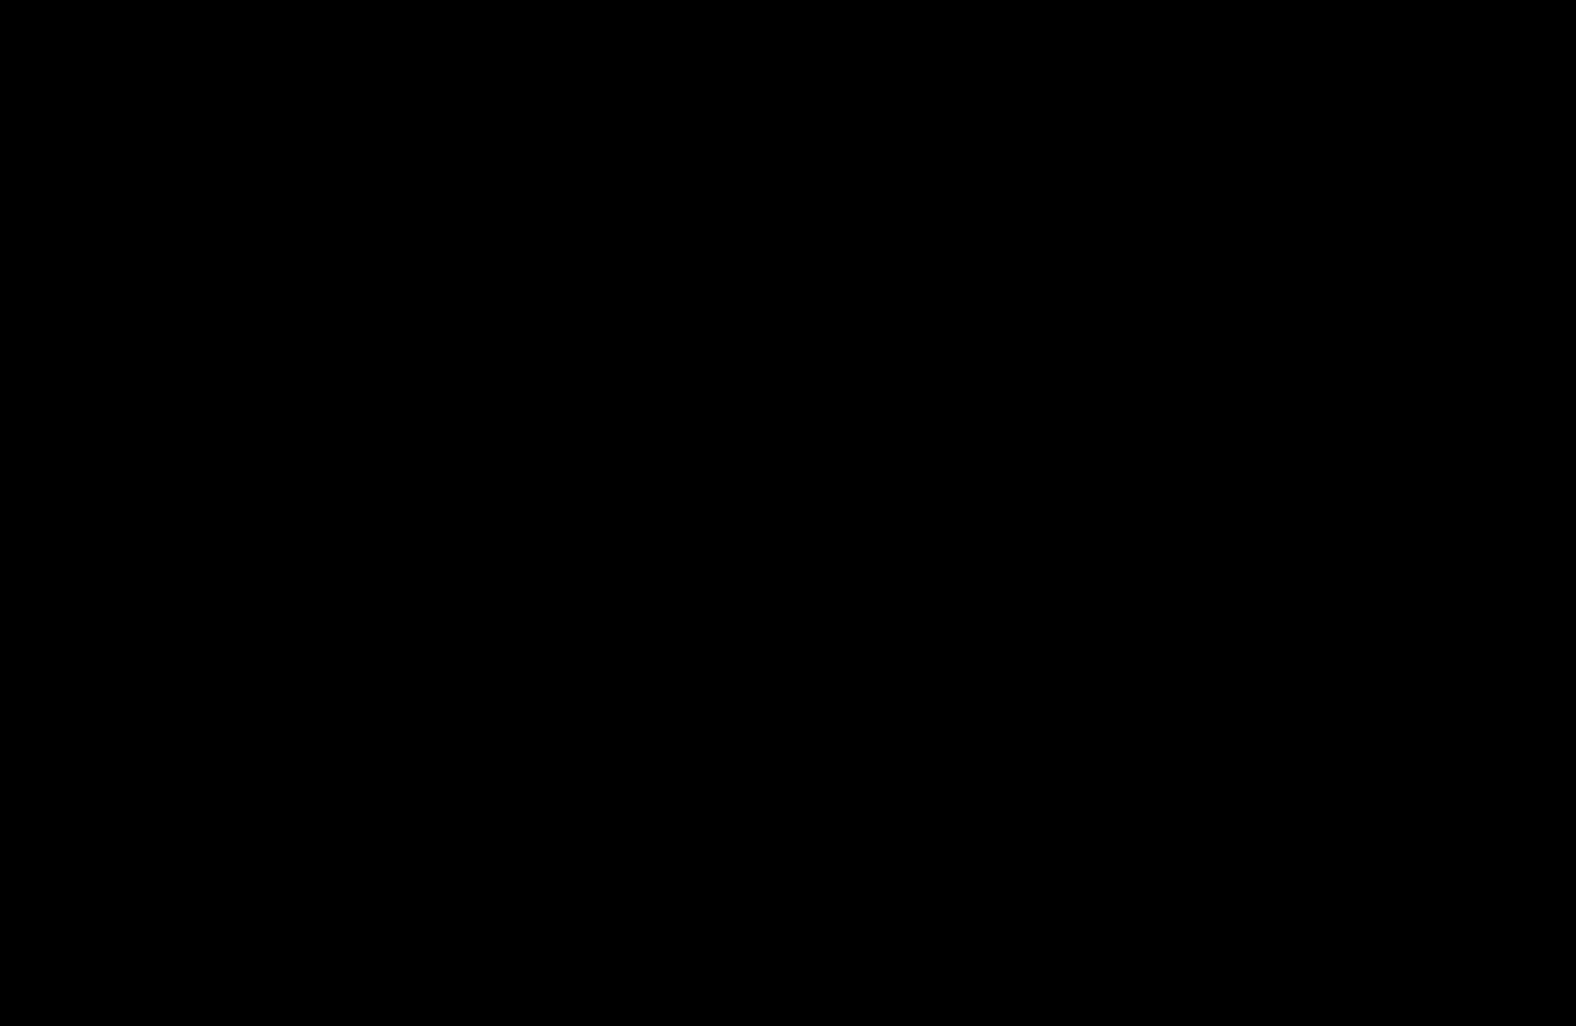 2,5-Difluorobenzene -1,4-bis(boronic acid pinacol ester)